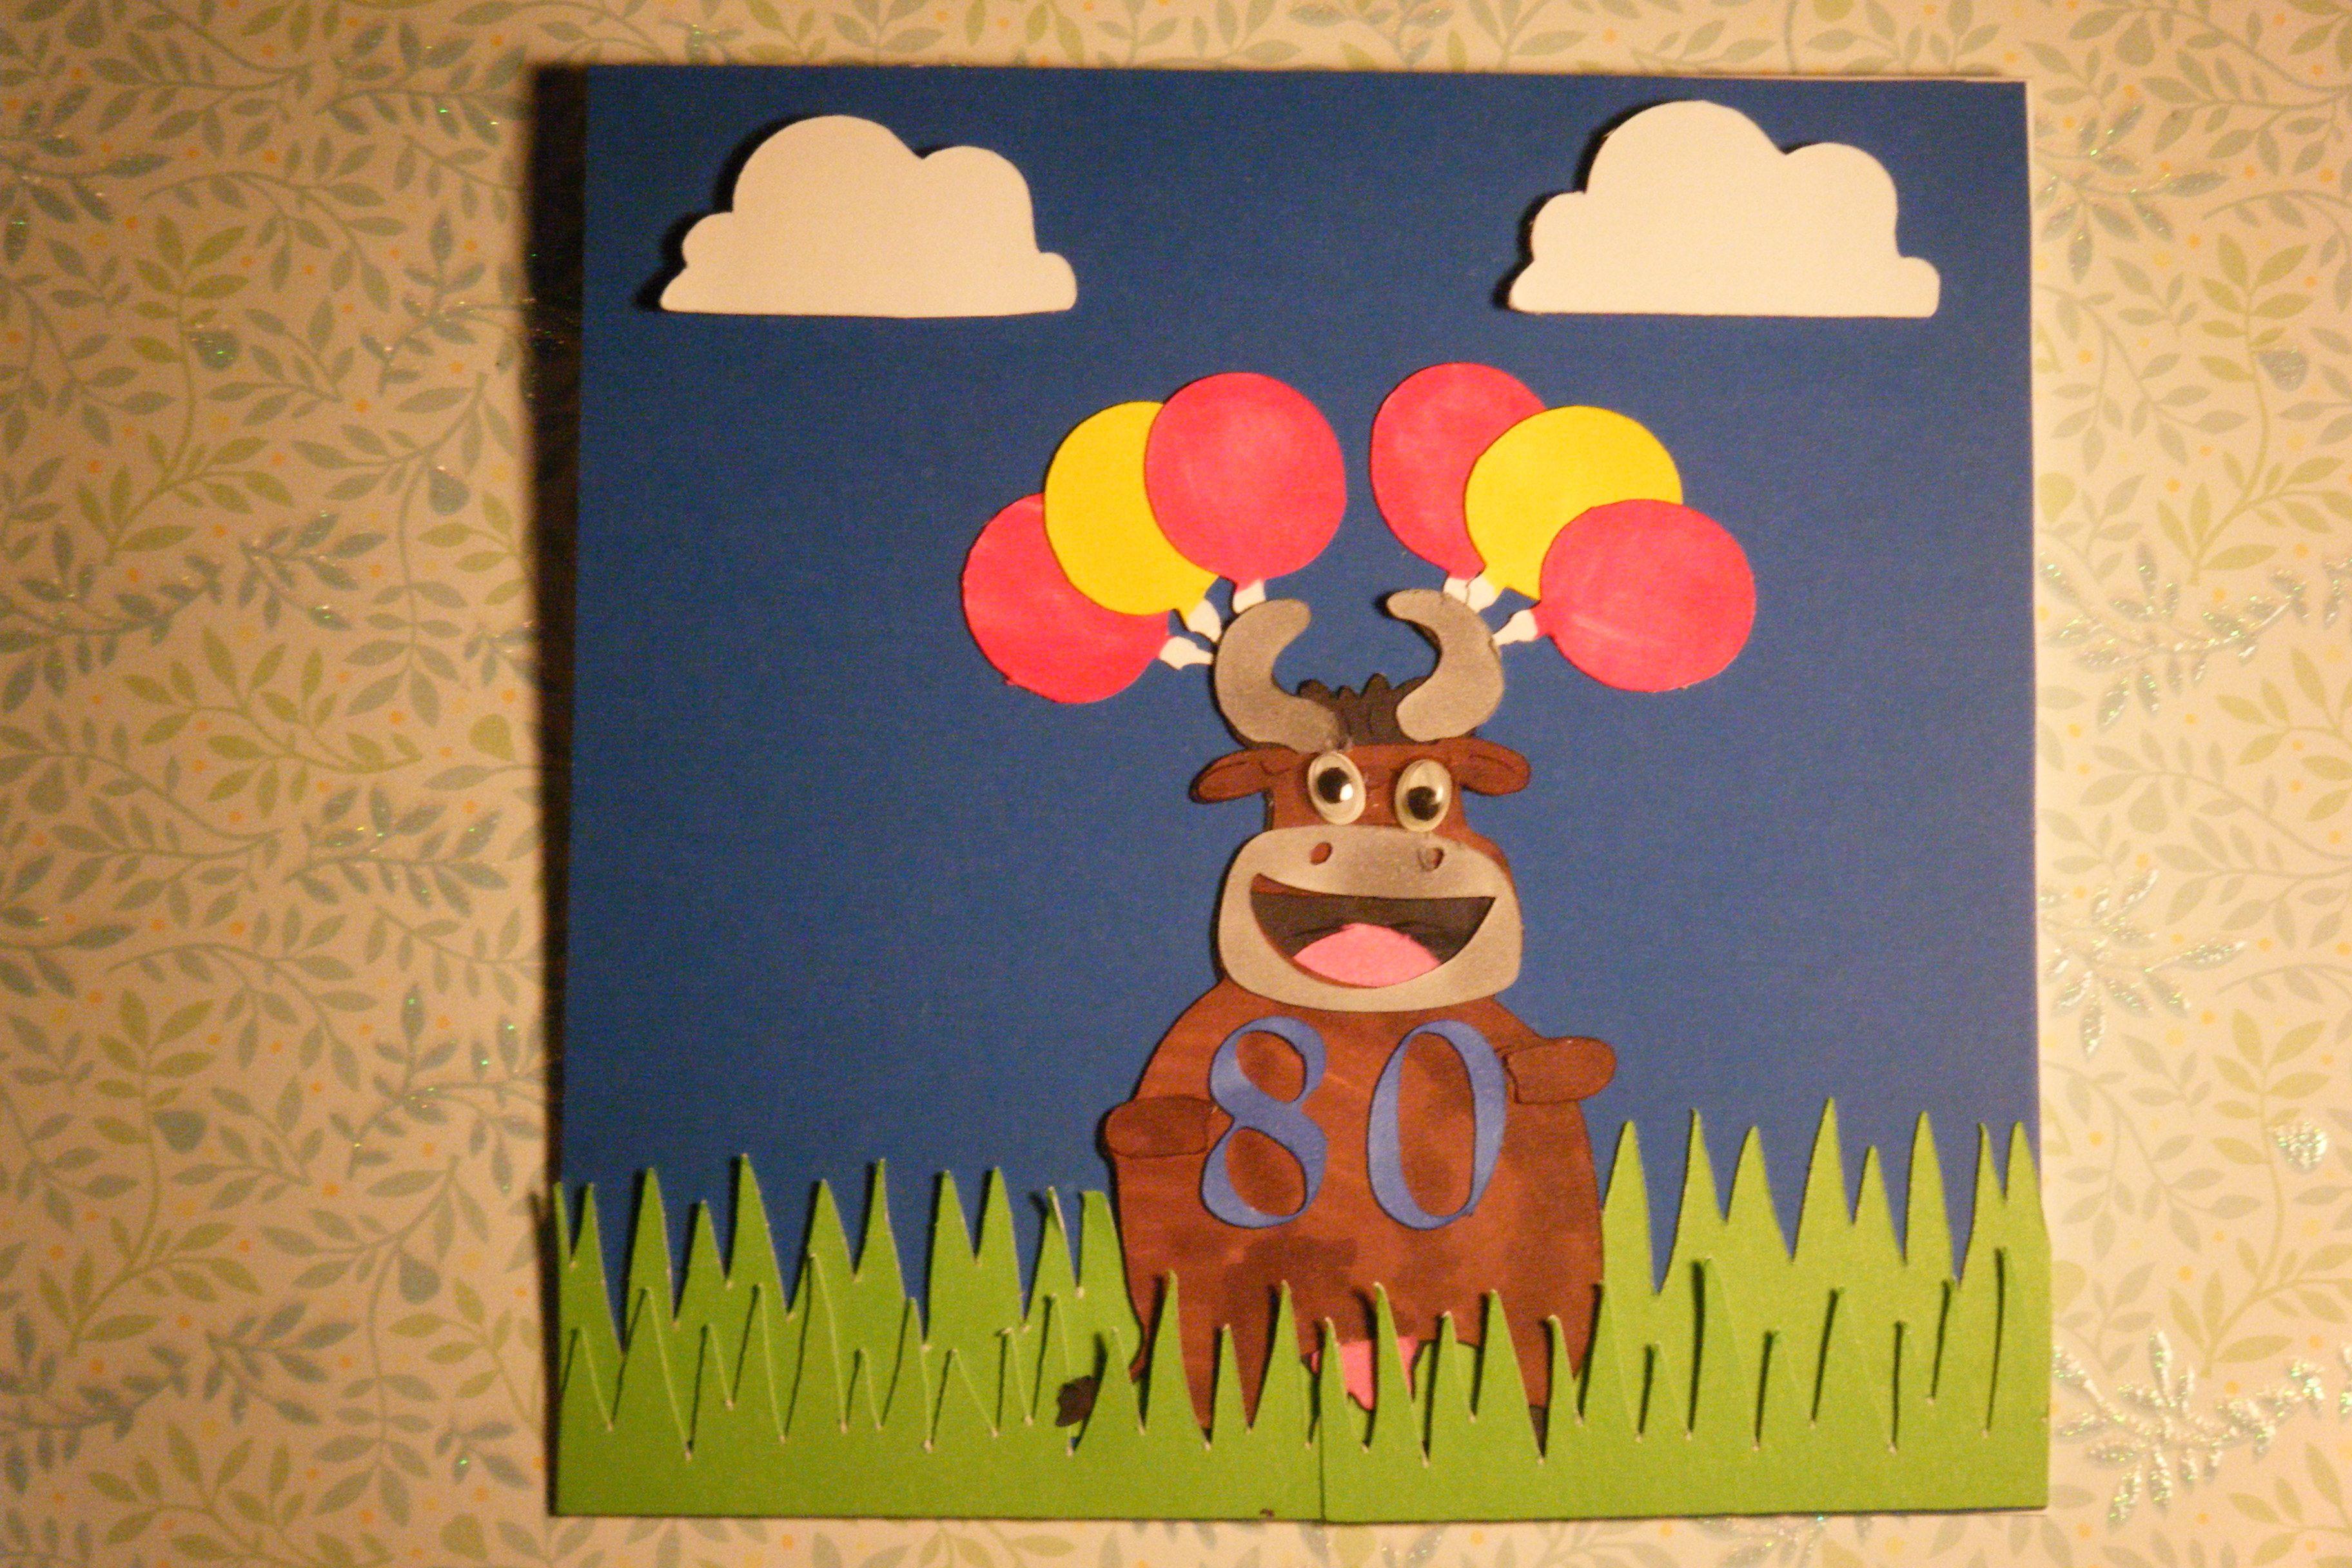 Cow Themed 80th Birthday Card